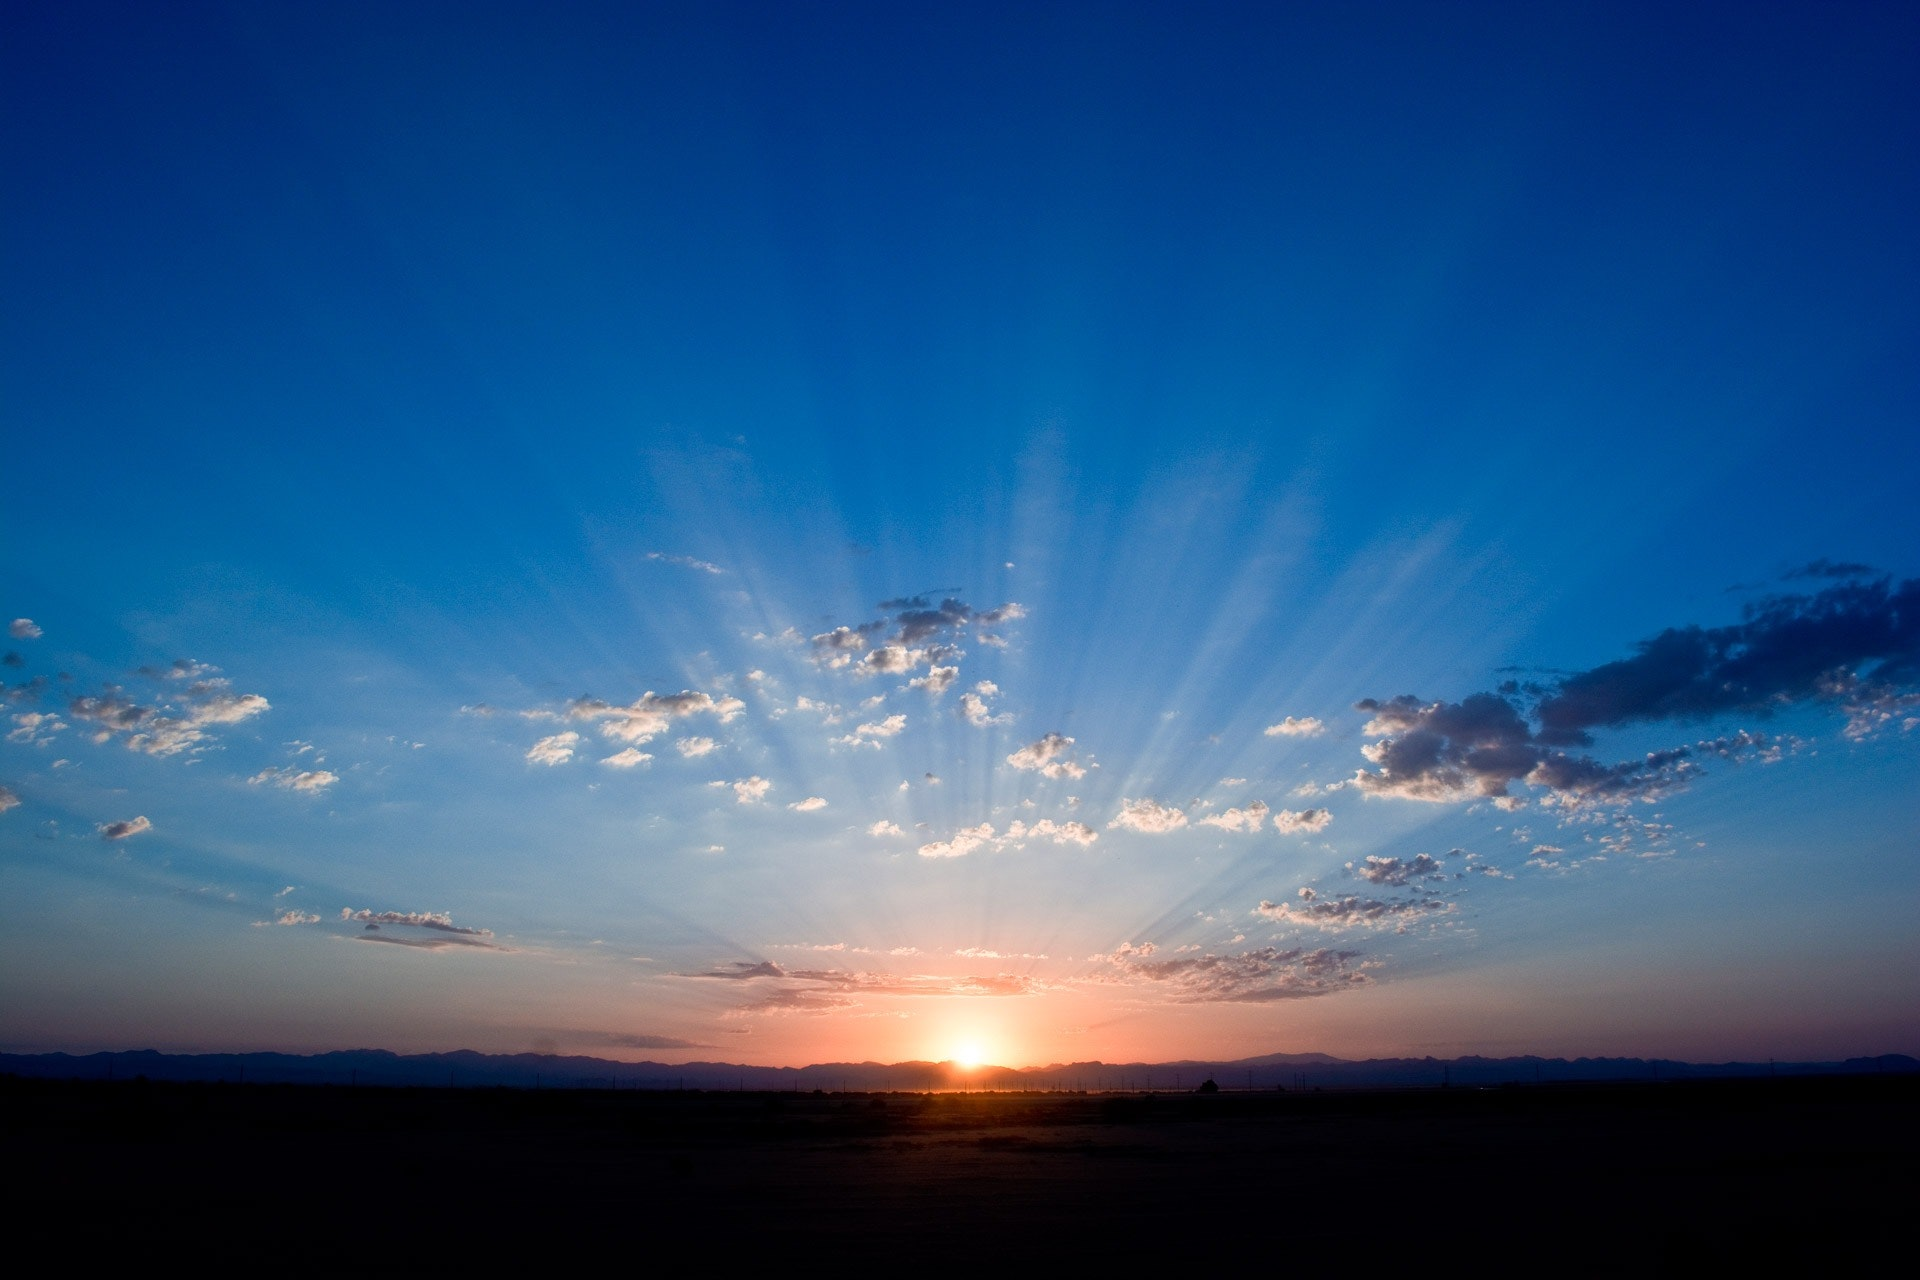 Free photo: Sunrise Under Cloudy Sky Illustration - Sunrays, Sun ...